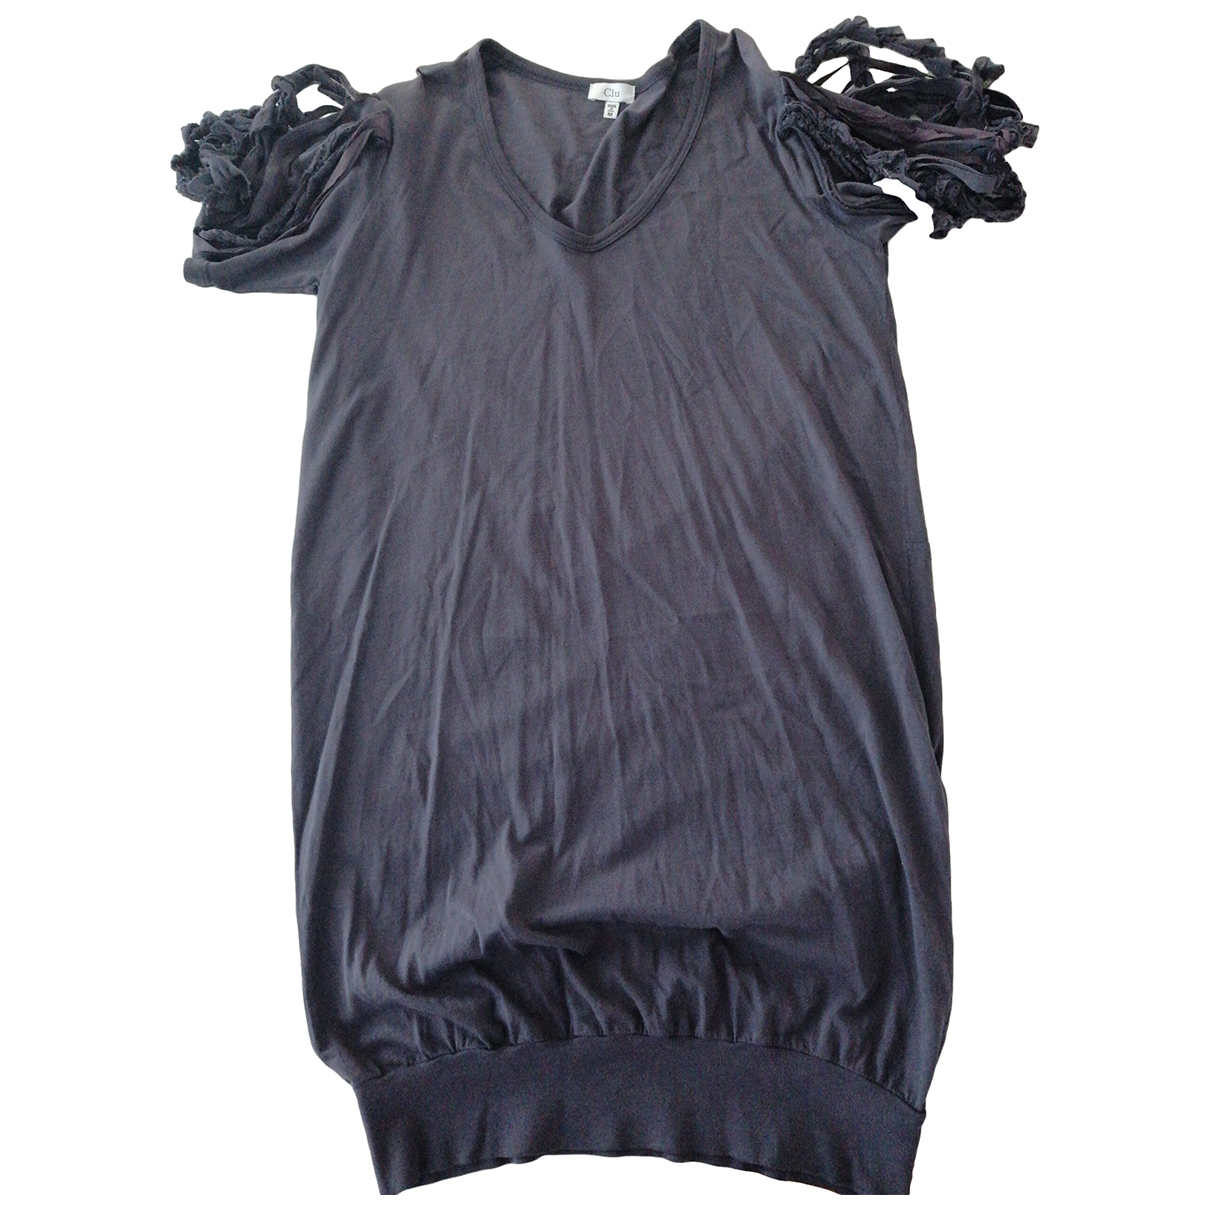 Clu \N Kleid in  Anthrazit Baumwolle